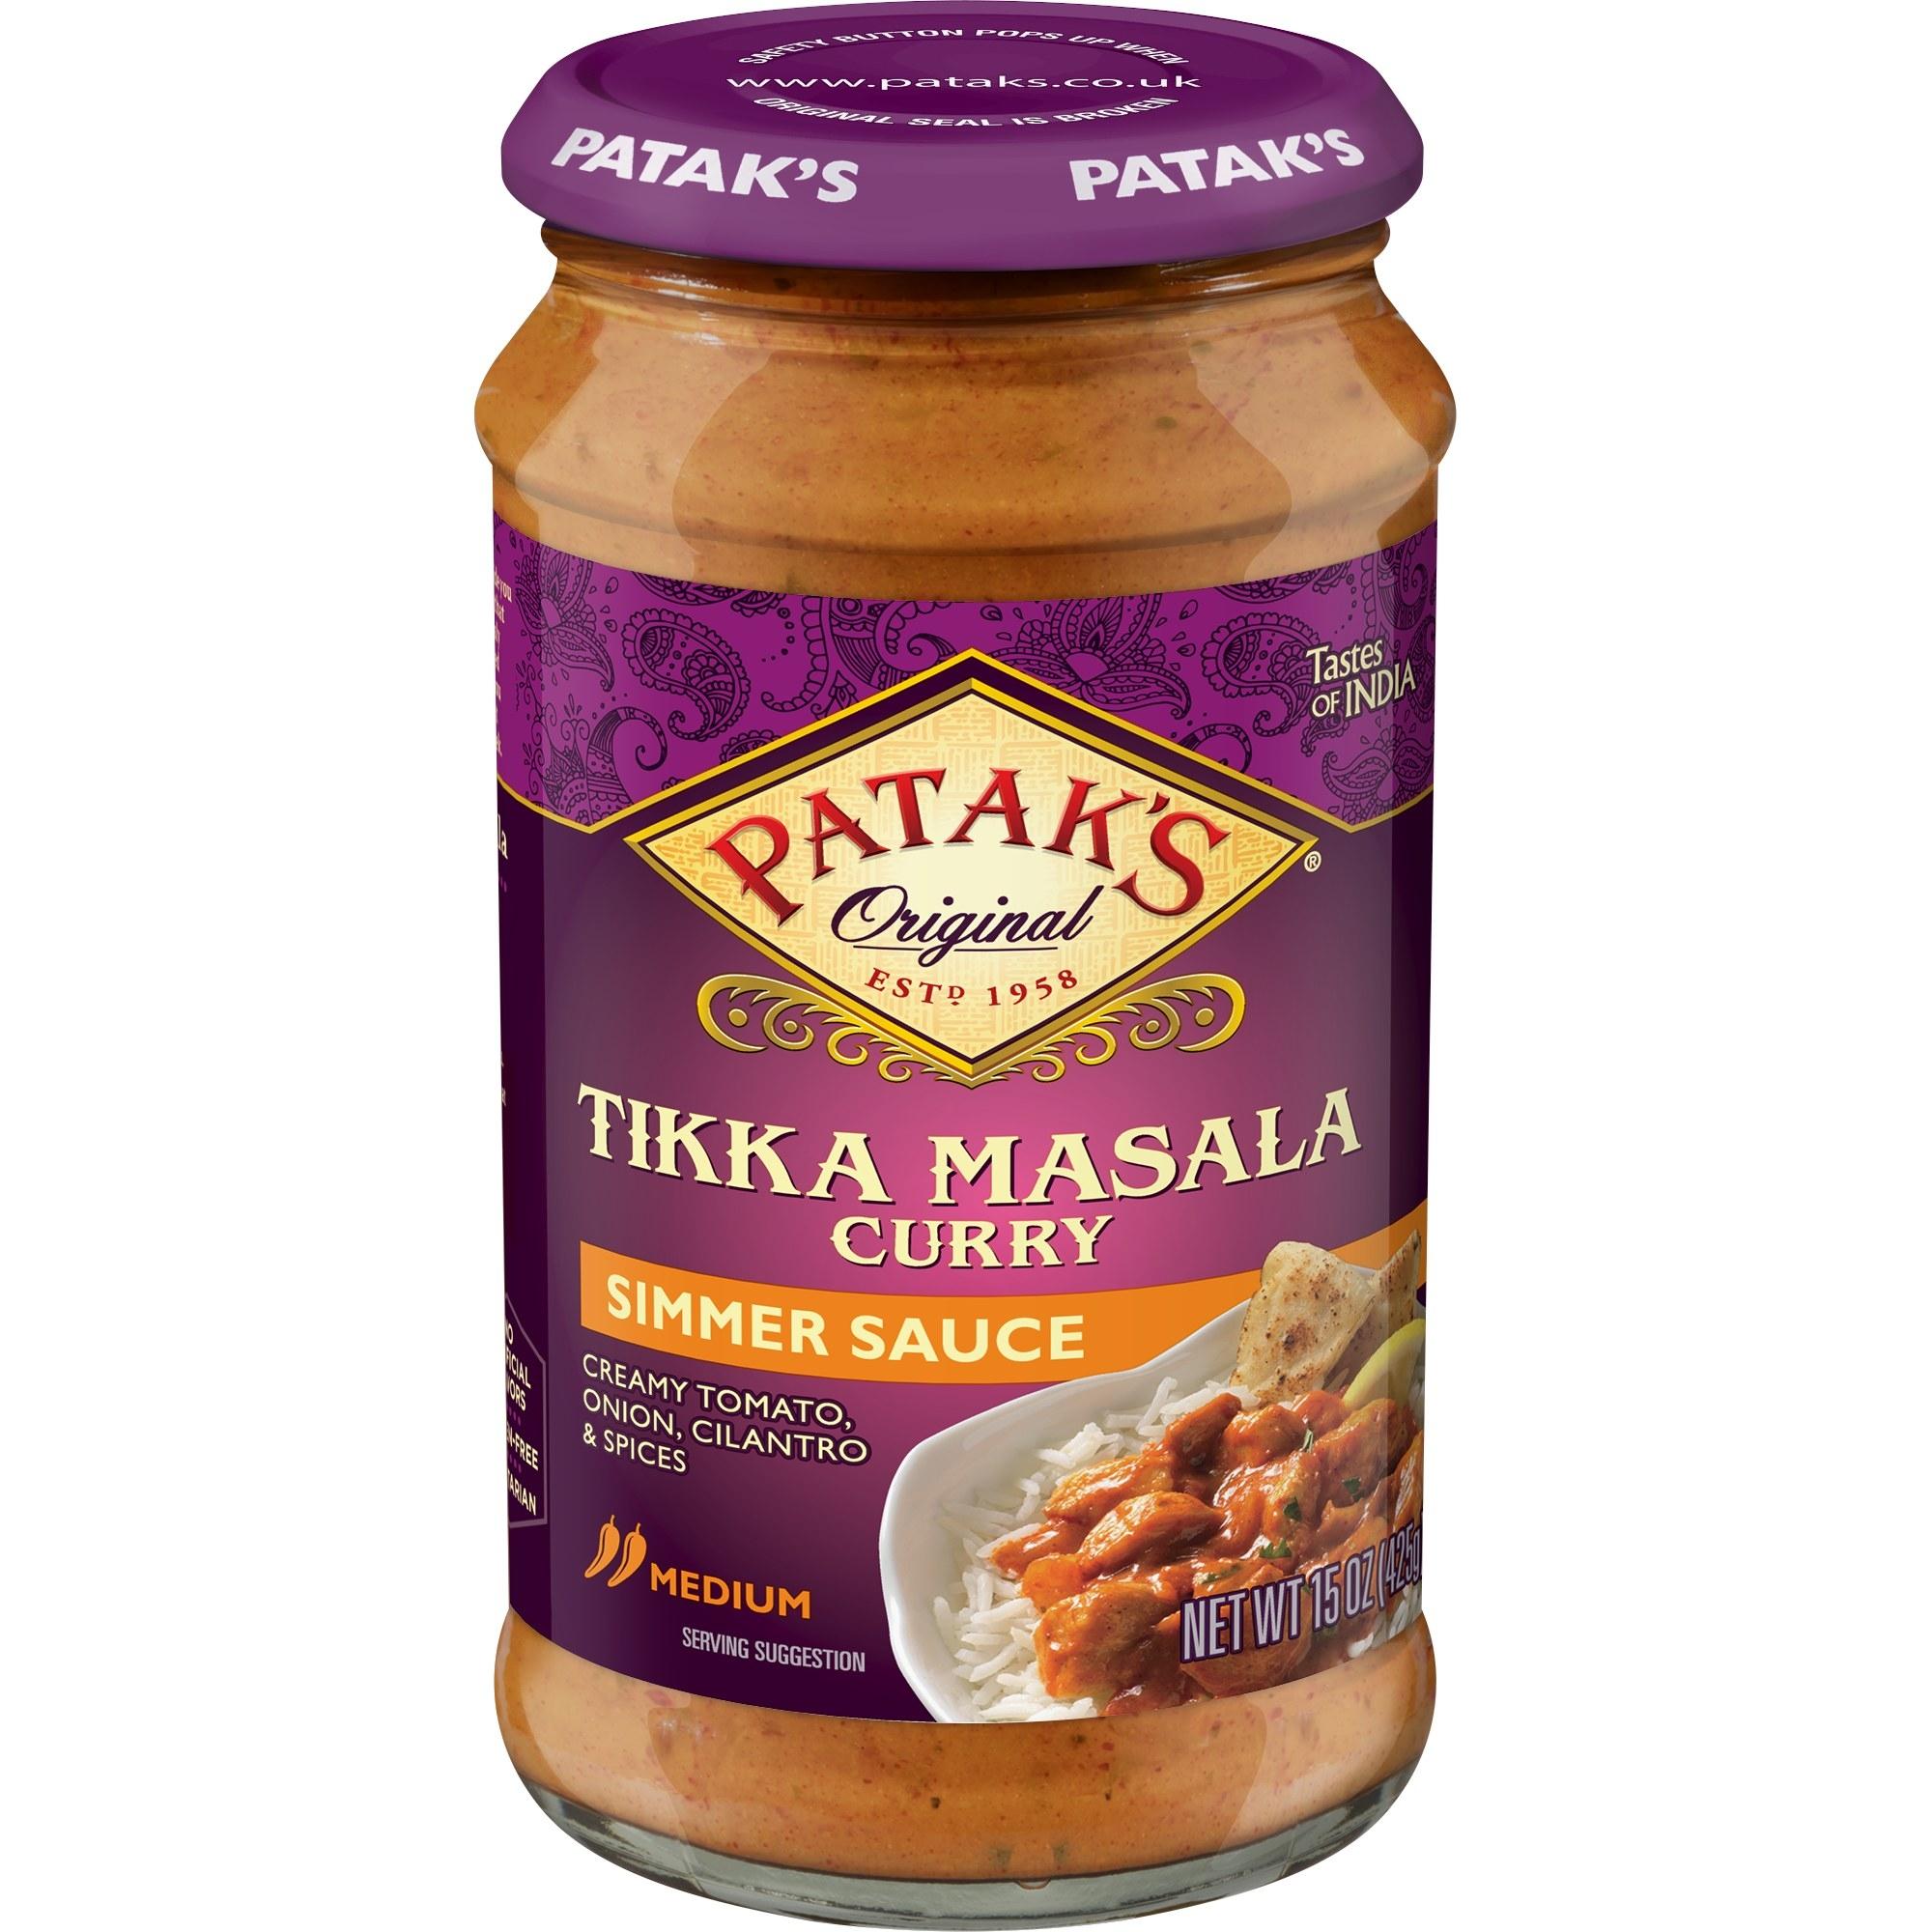 the purple jar of sauce